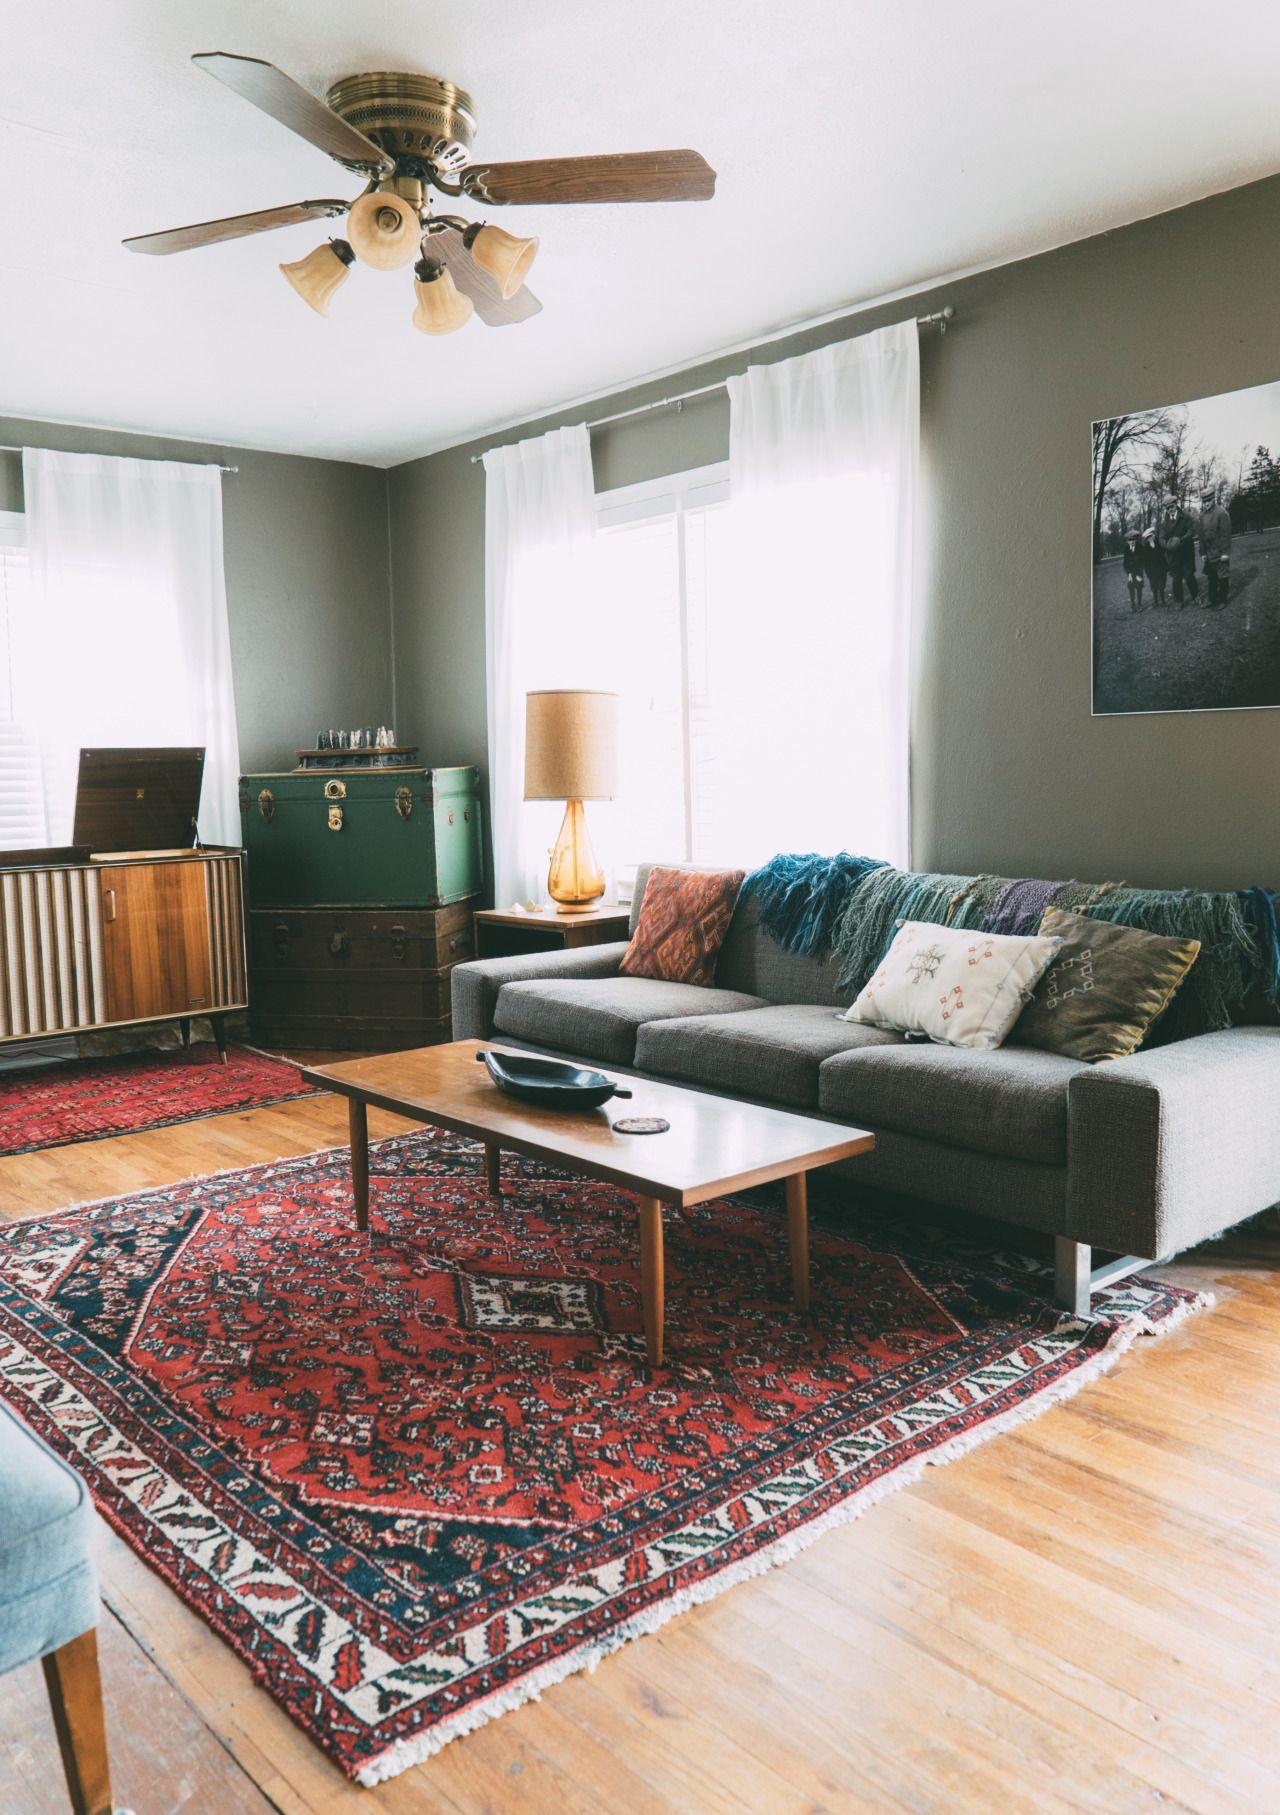 Pin de jp en deco pinterest sala de estar tv y deco for Decoracion persa